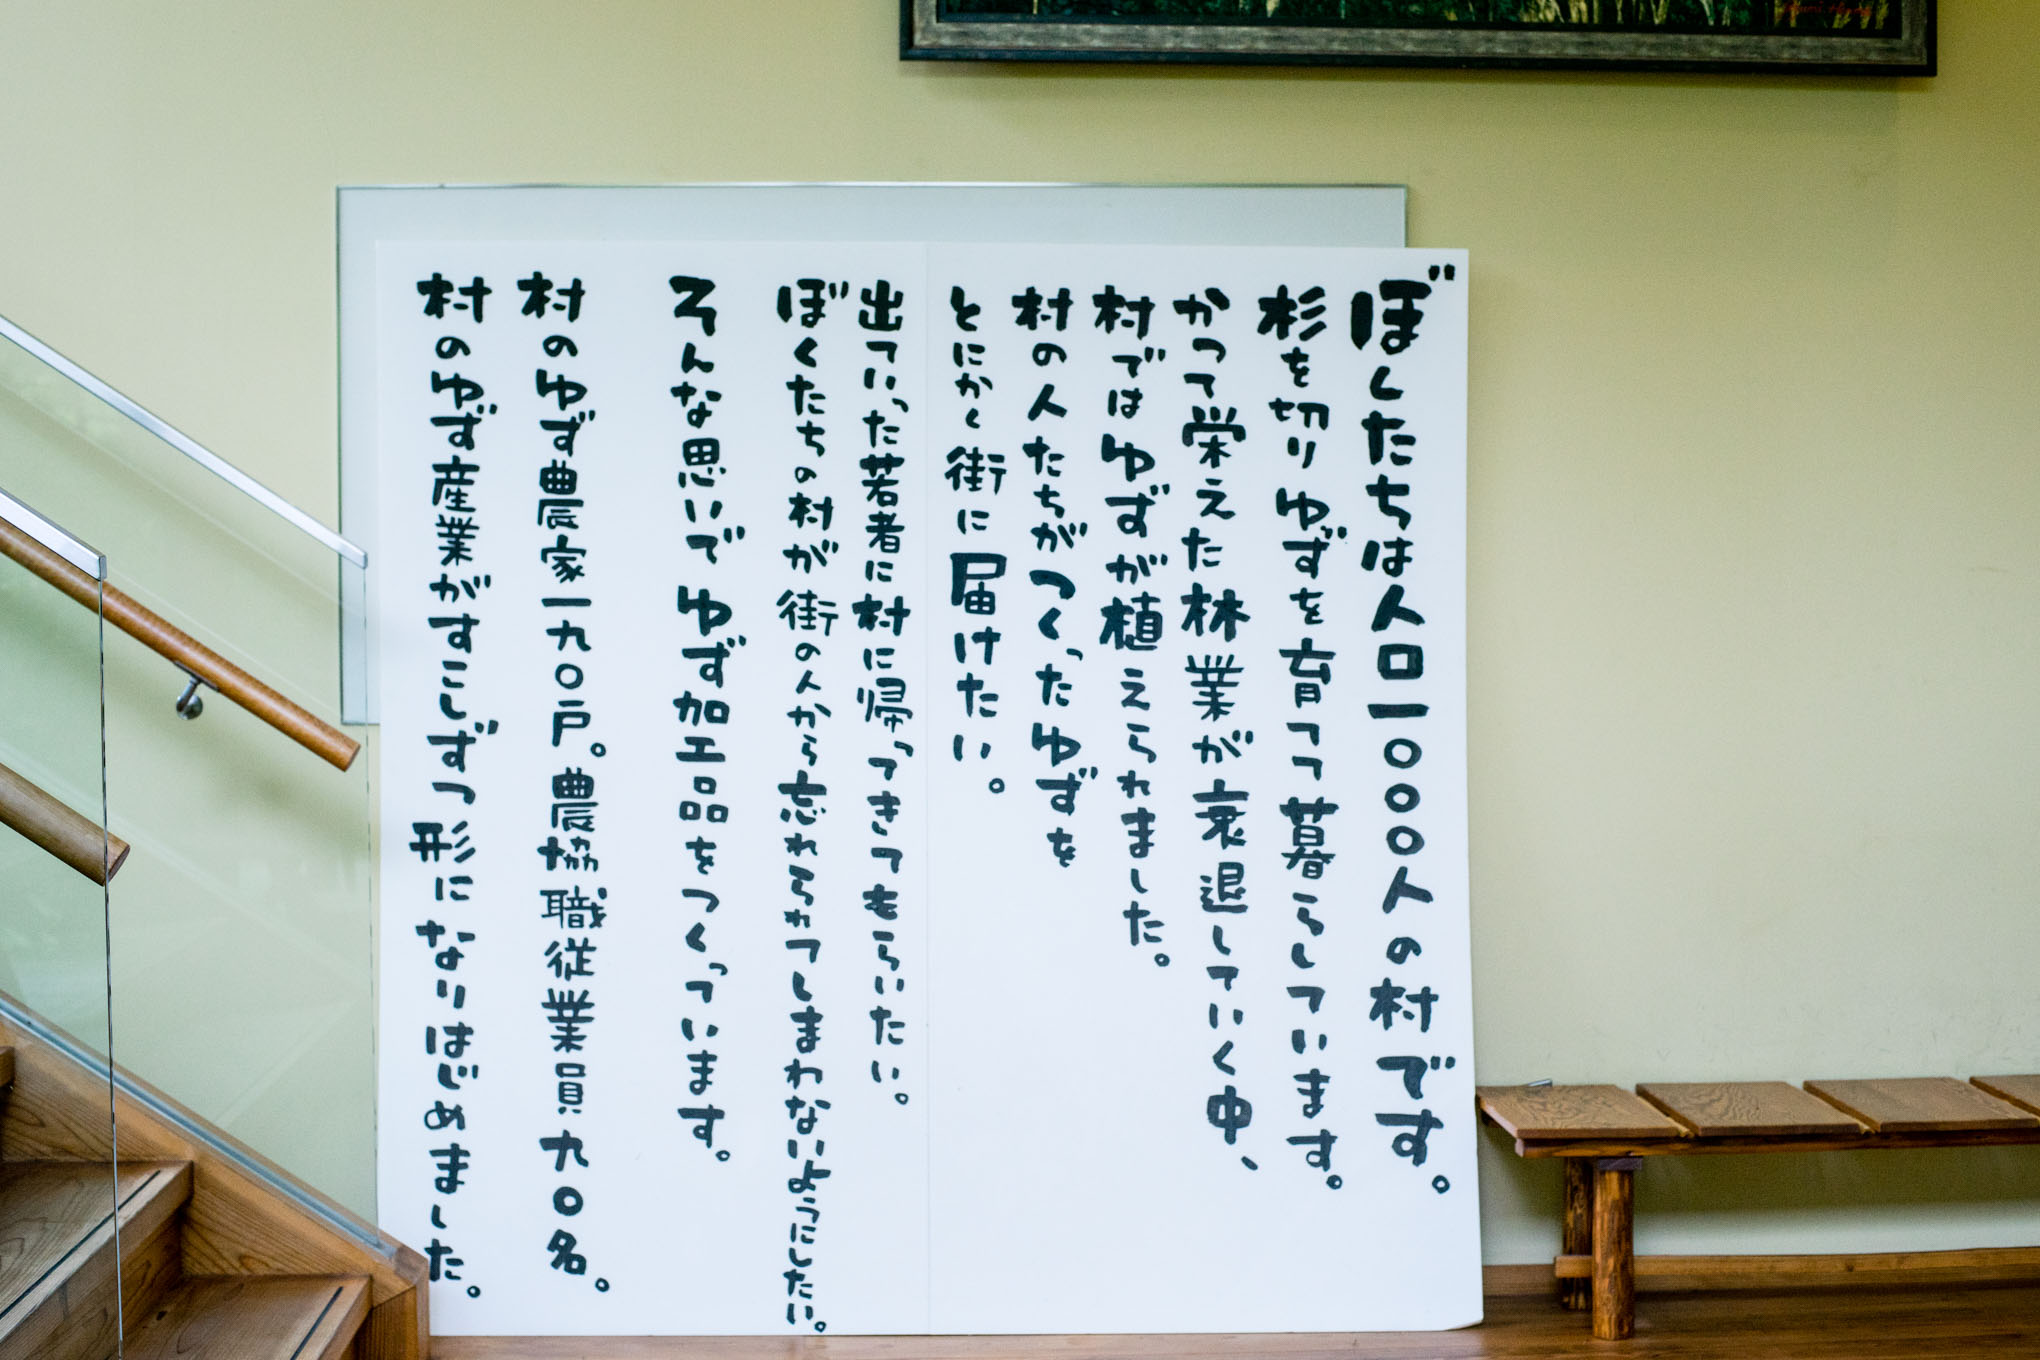 umajimura-2015-15